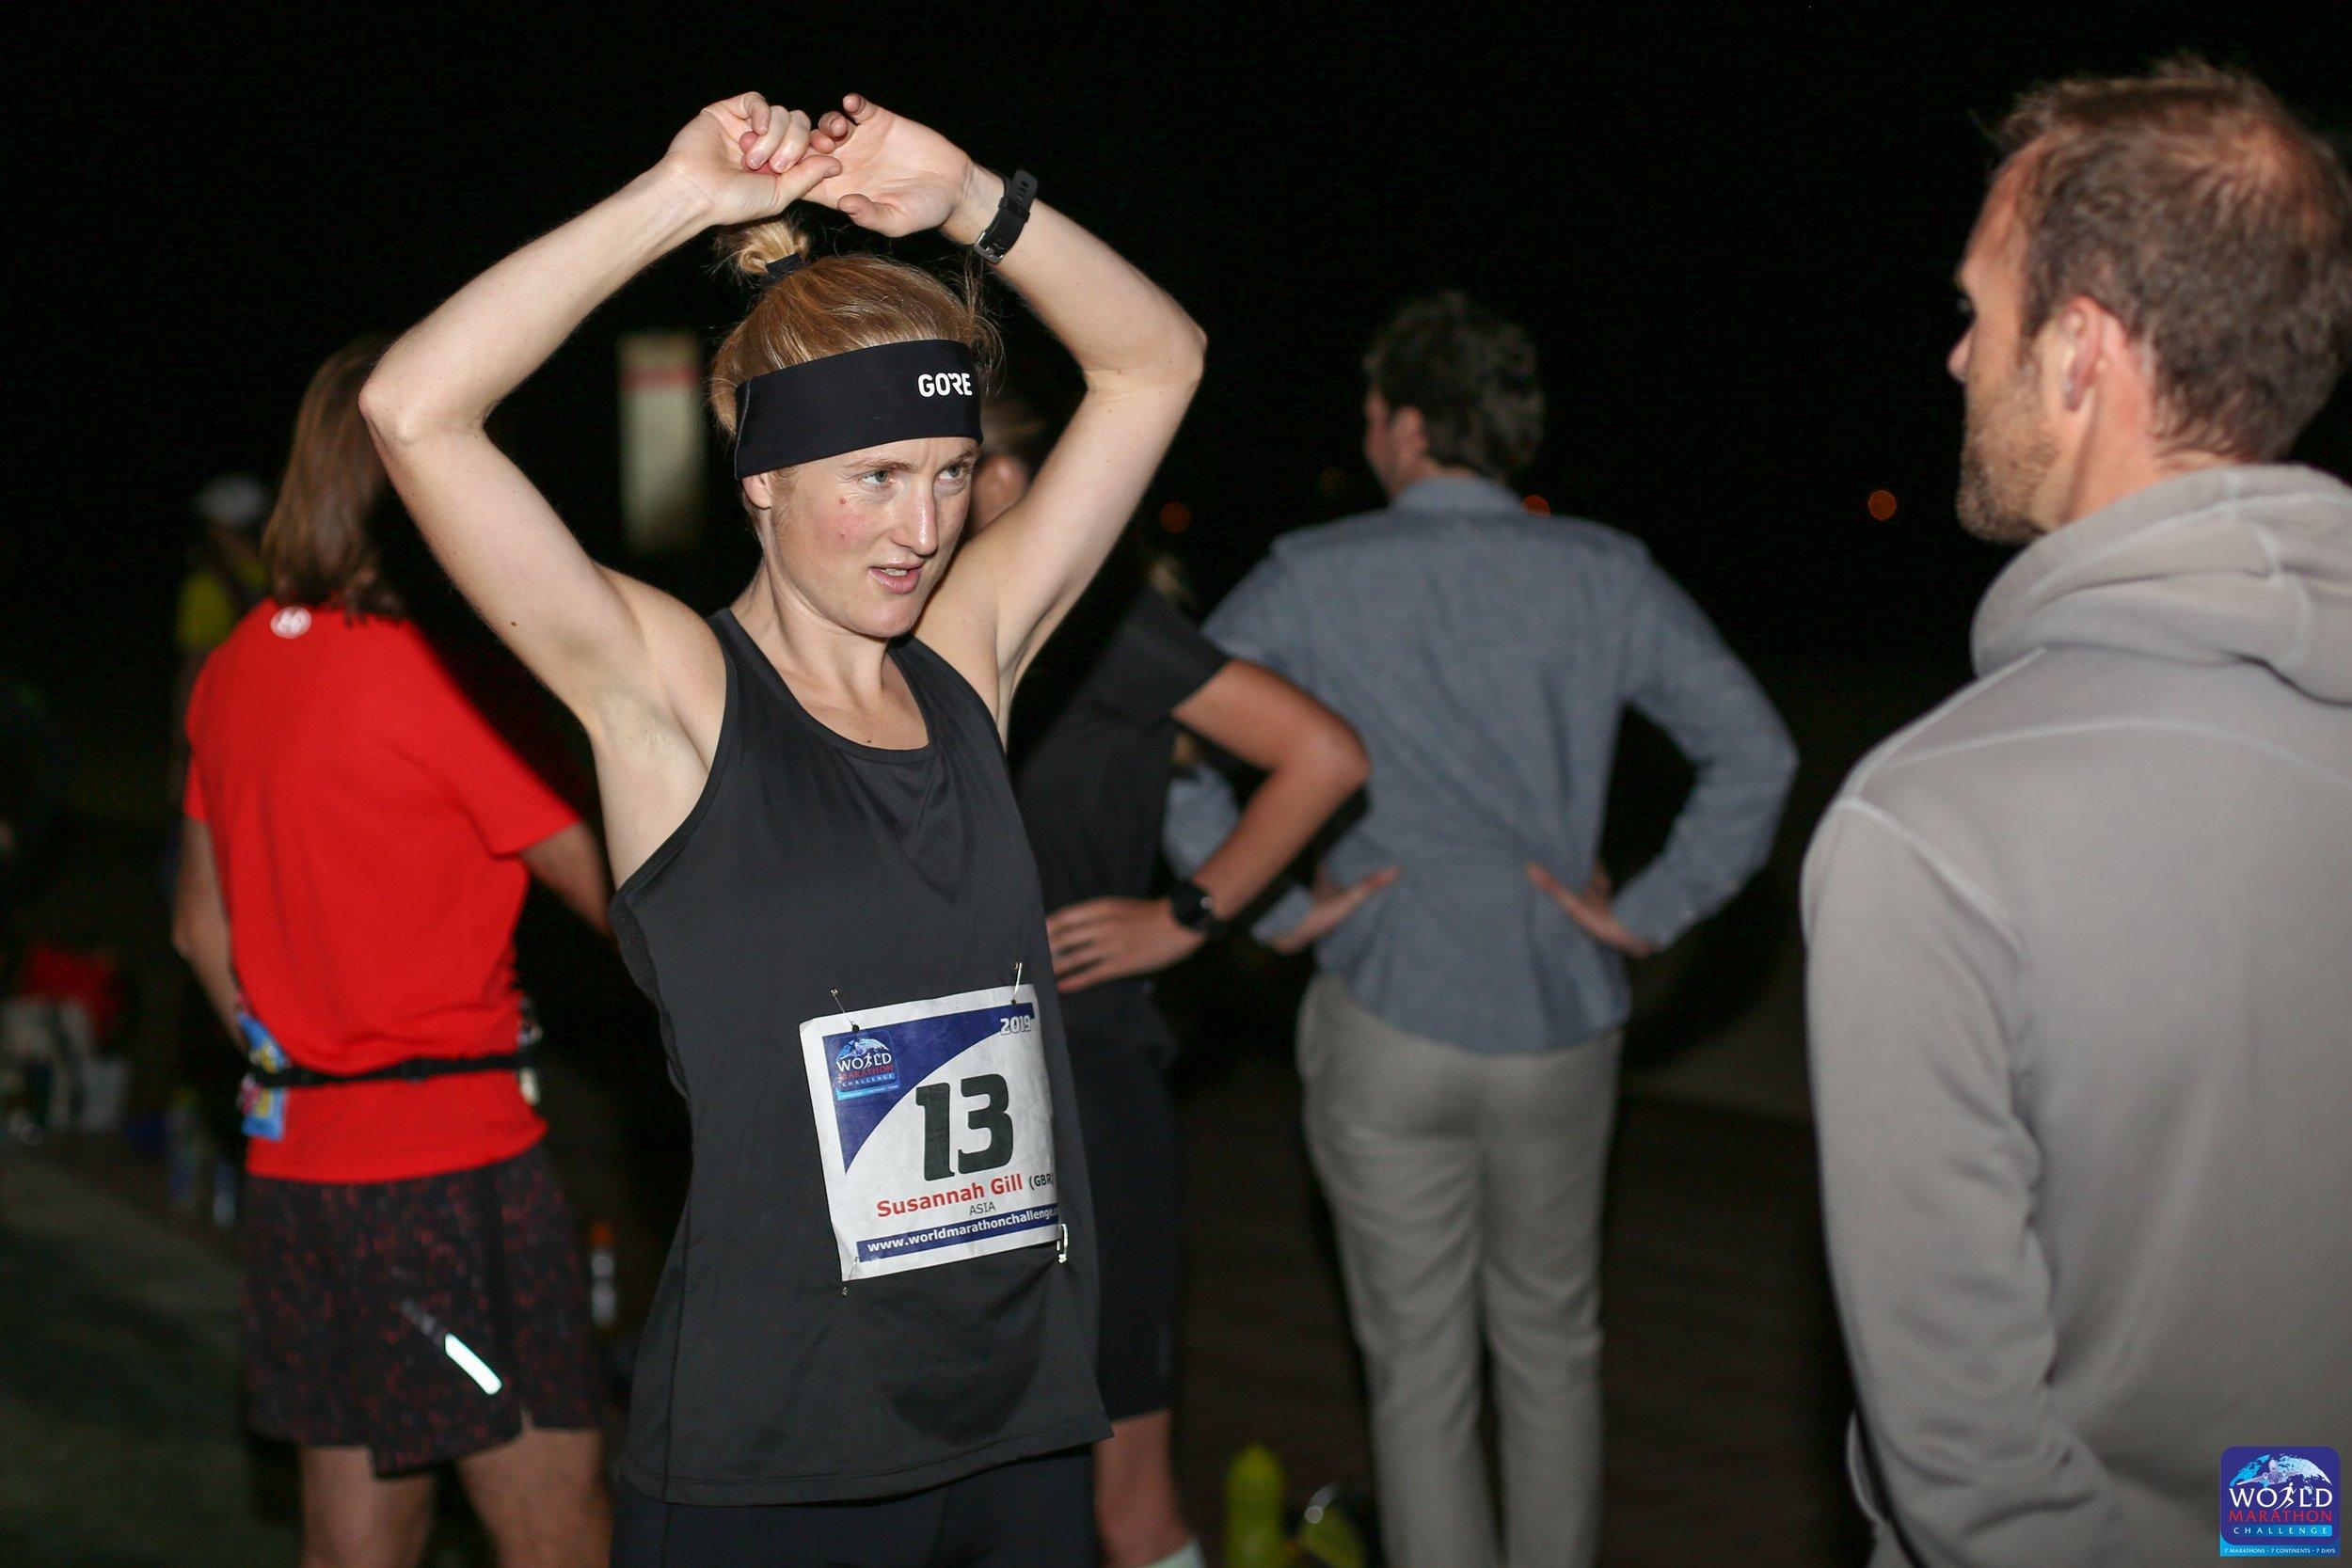 Susannah Gill at the start in Dubai .jpg